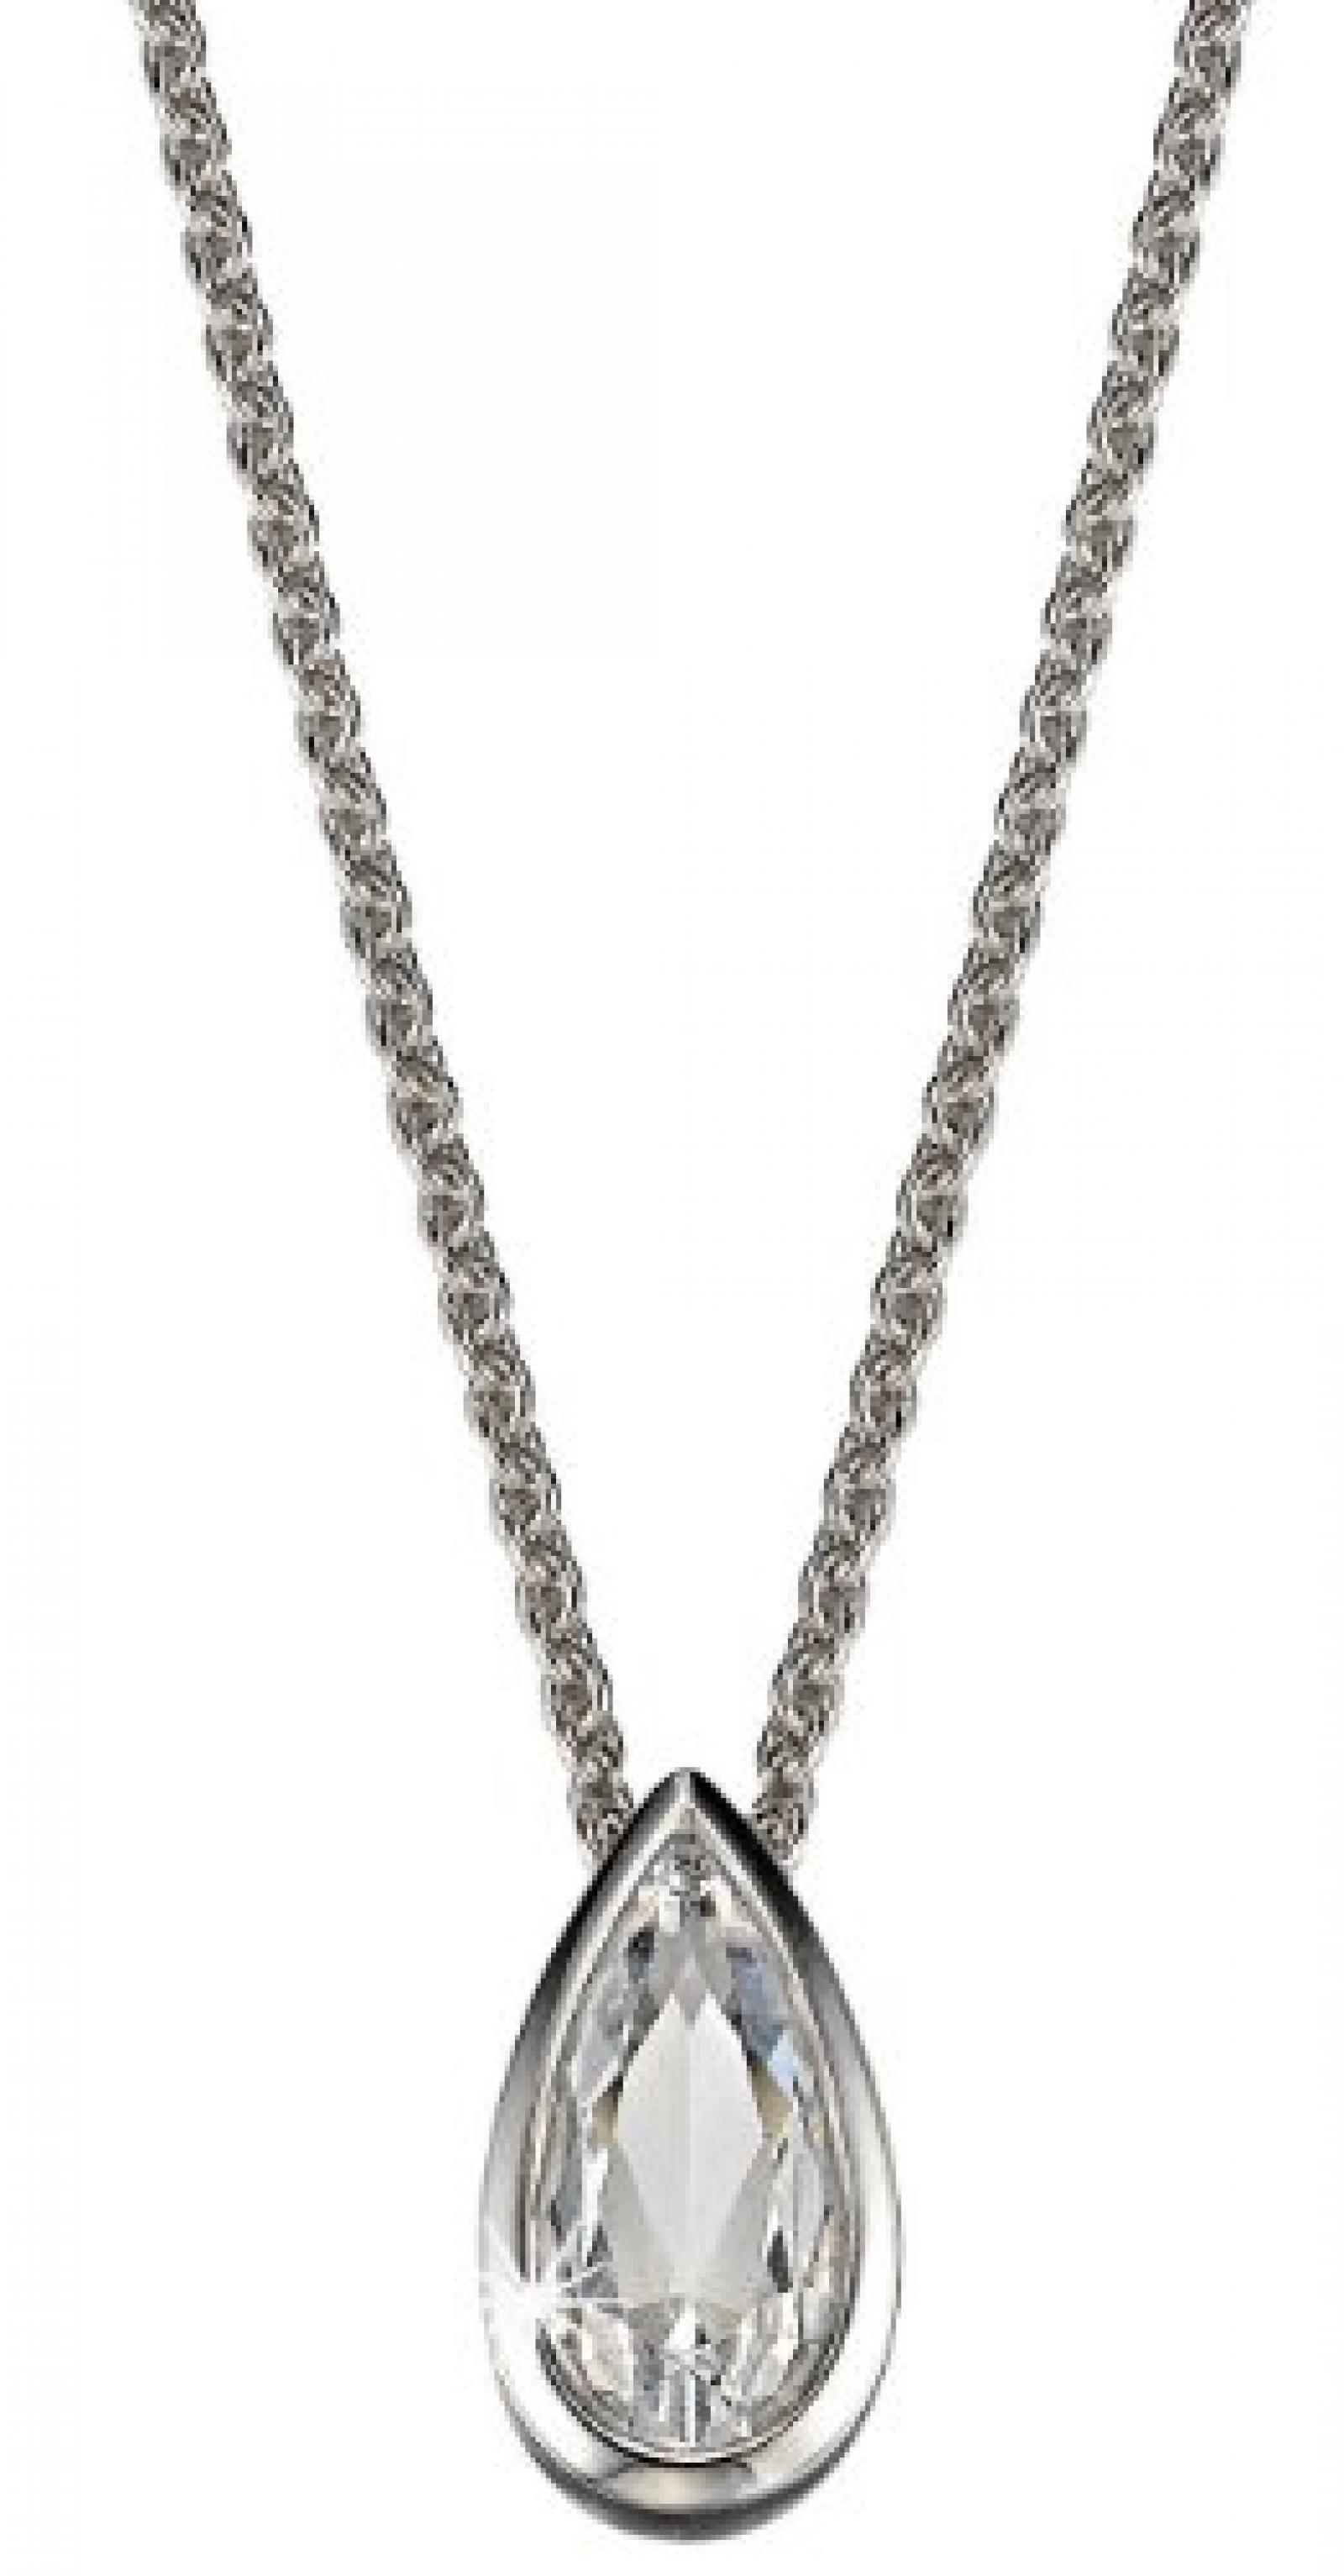 Pierre Cardin Damen Halskette 925 Sterling Silber rhodiniert Kristall Zirkonia Yeux en amandes 42 cm weiß PCNL90416A420